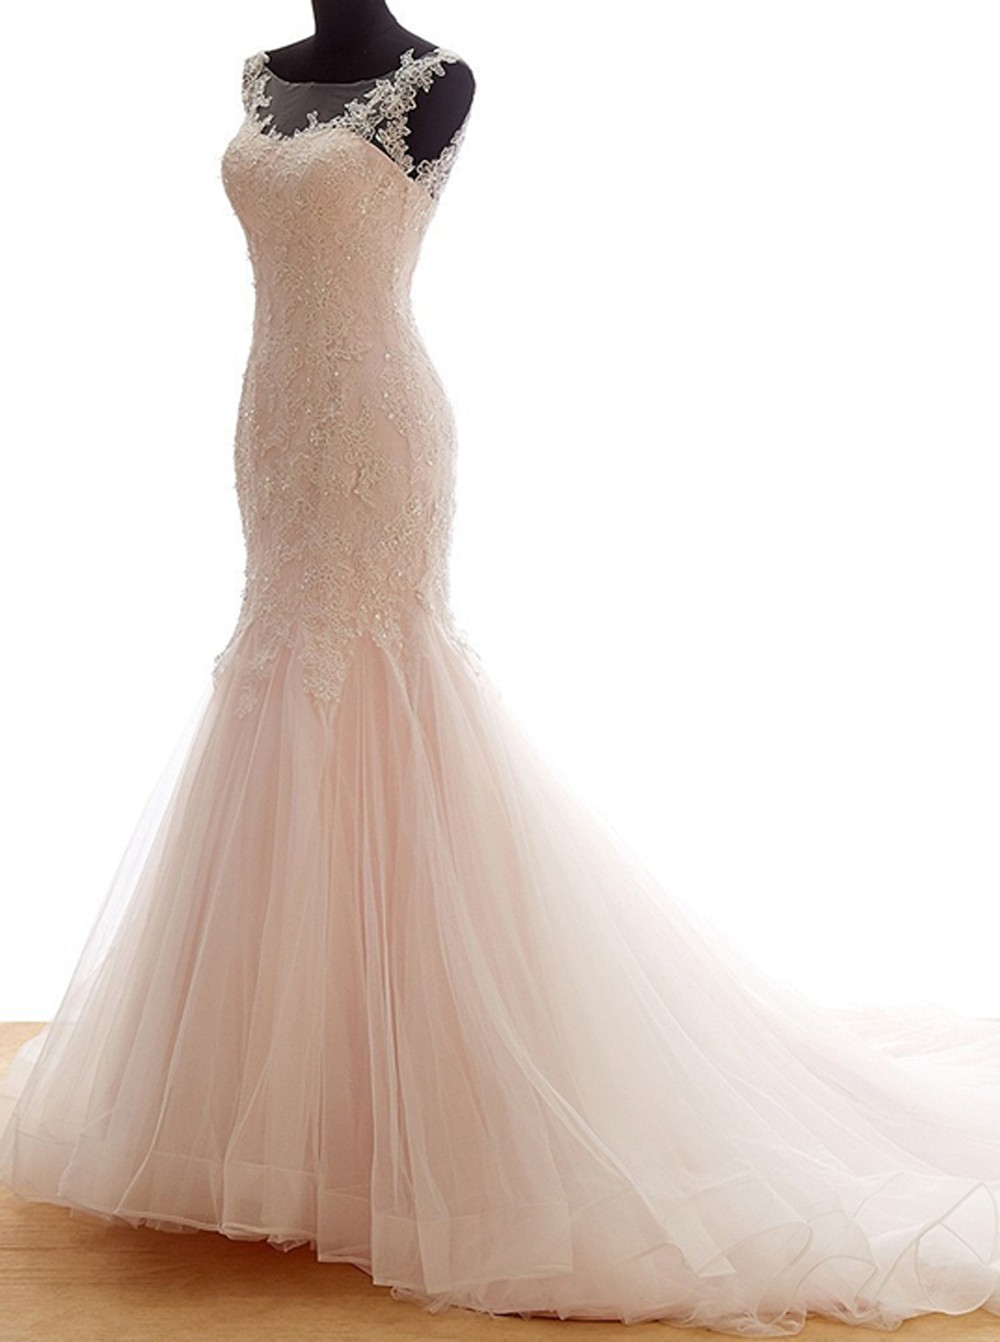 Pink lace bridal dressmermaid wedding dress with trainbeautiful